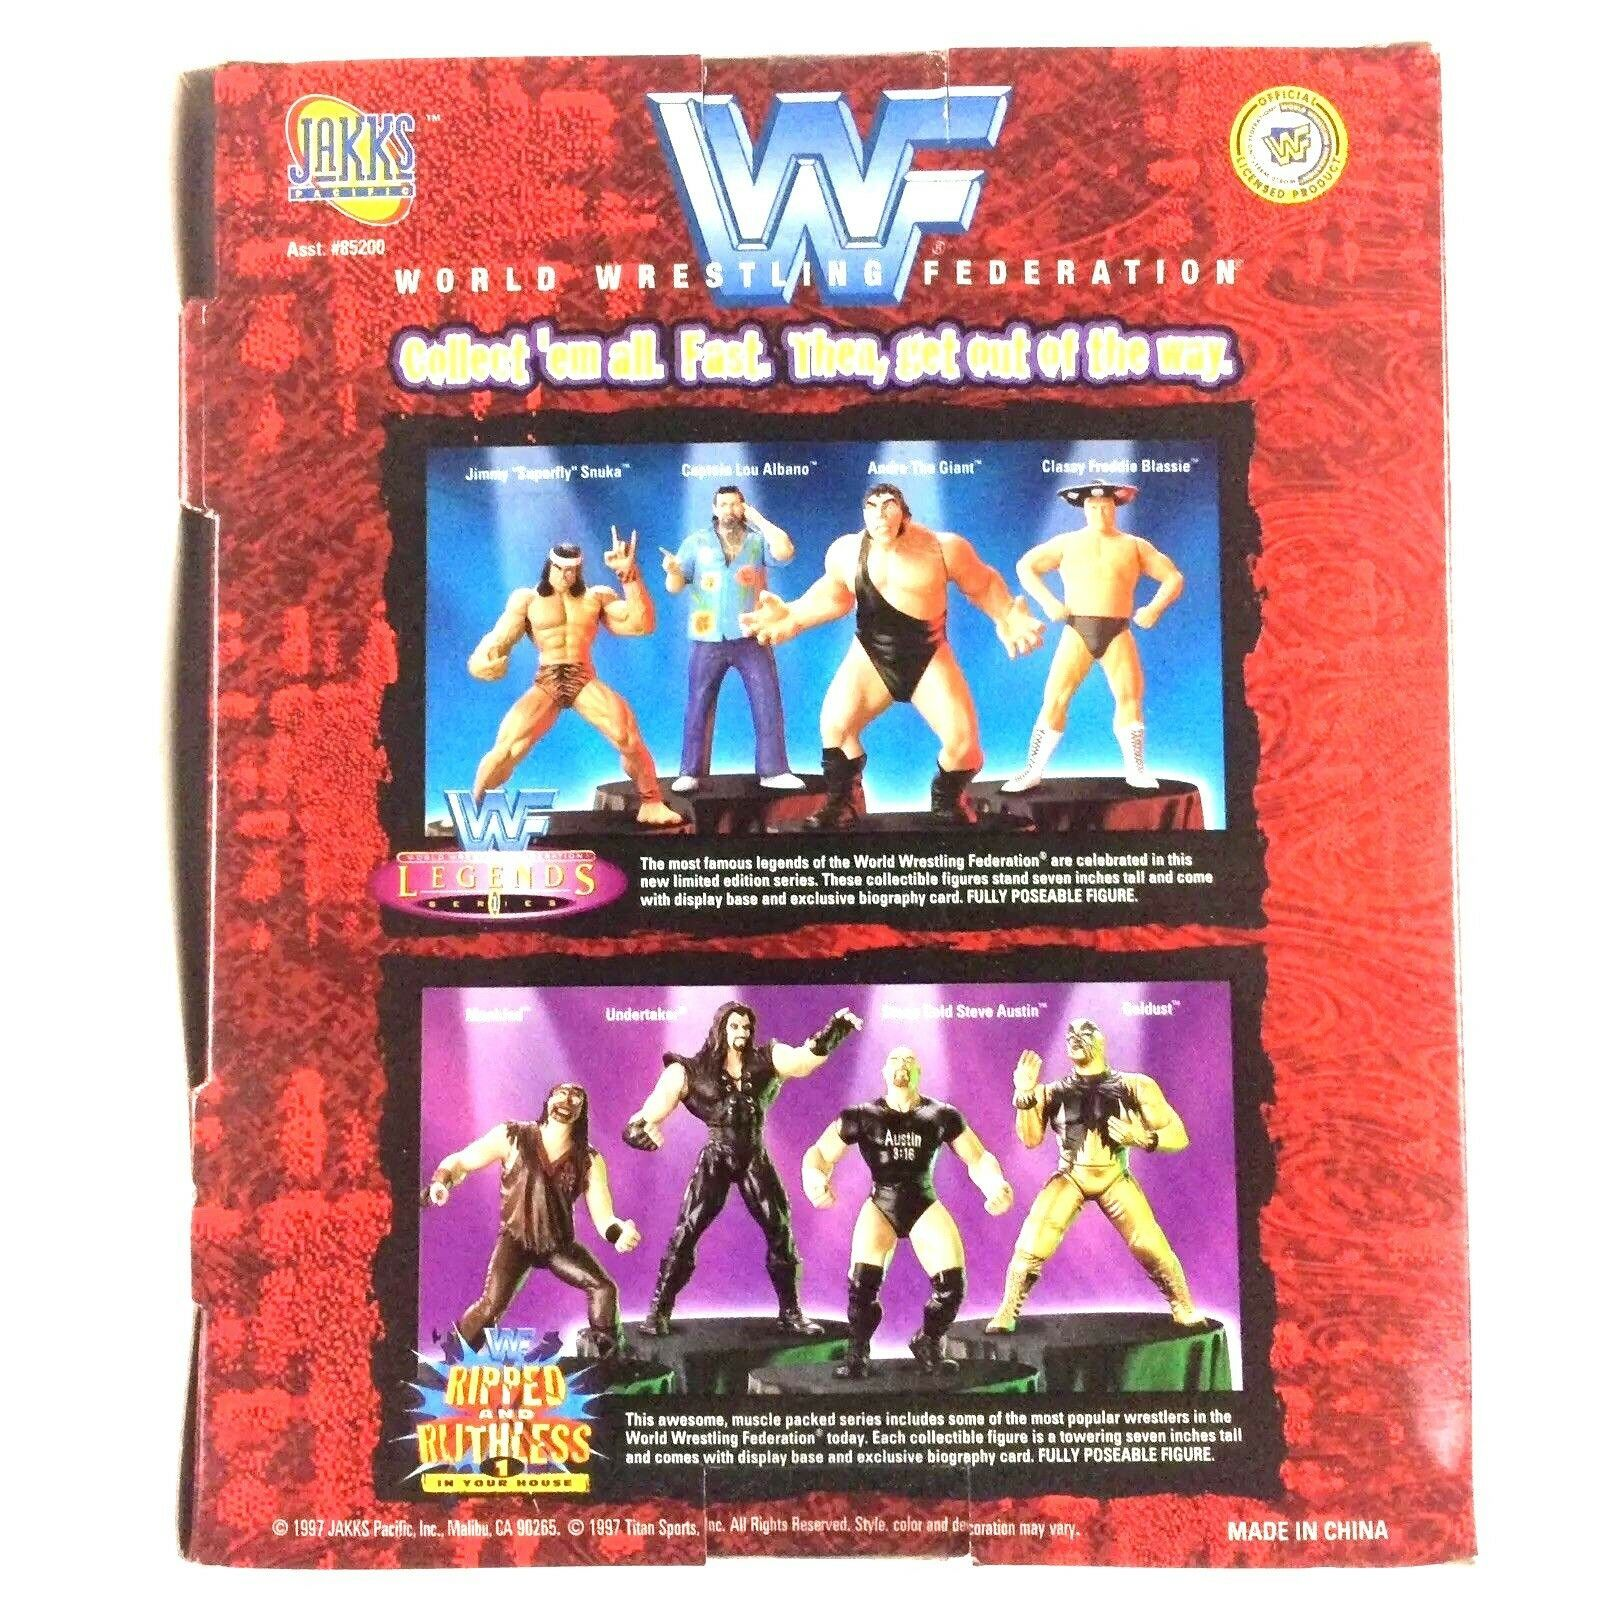 Stone Cold Steve Austin WWF WWE Jakks Figure Ripped and Ruthless Series 1 1997